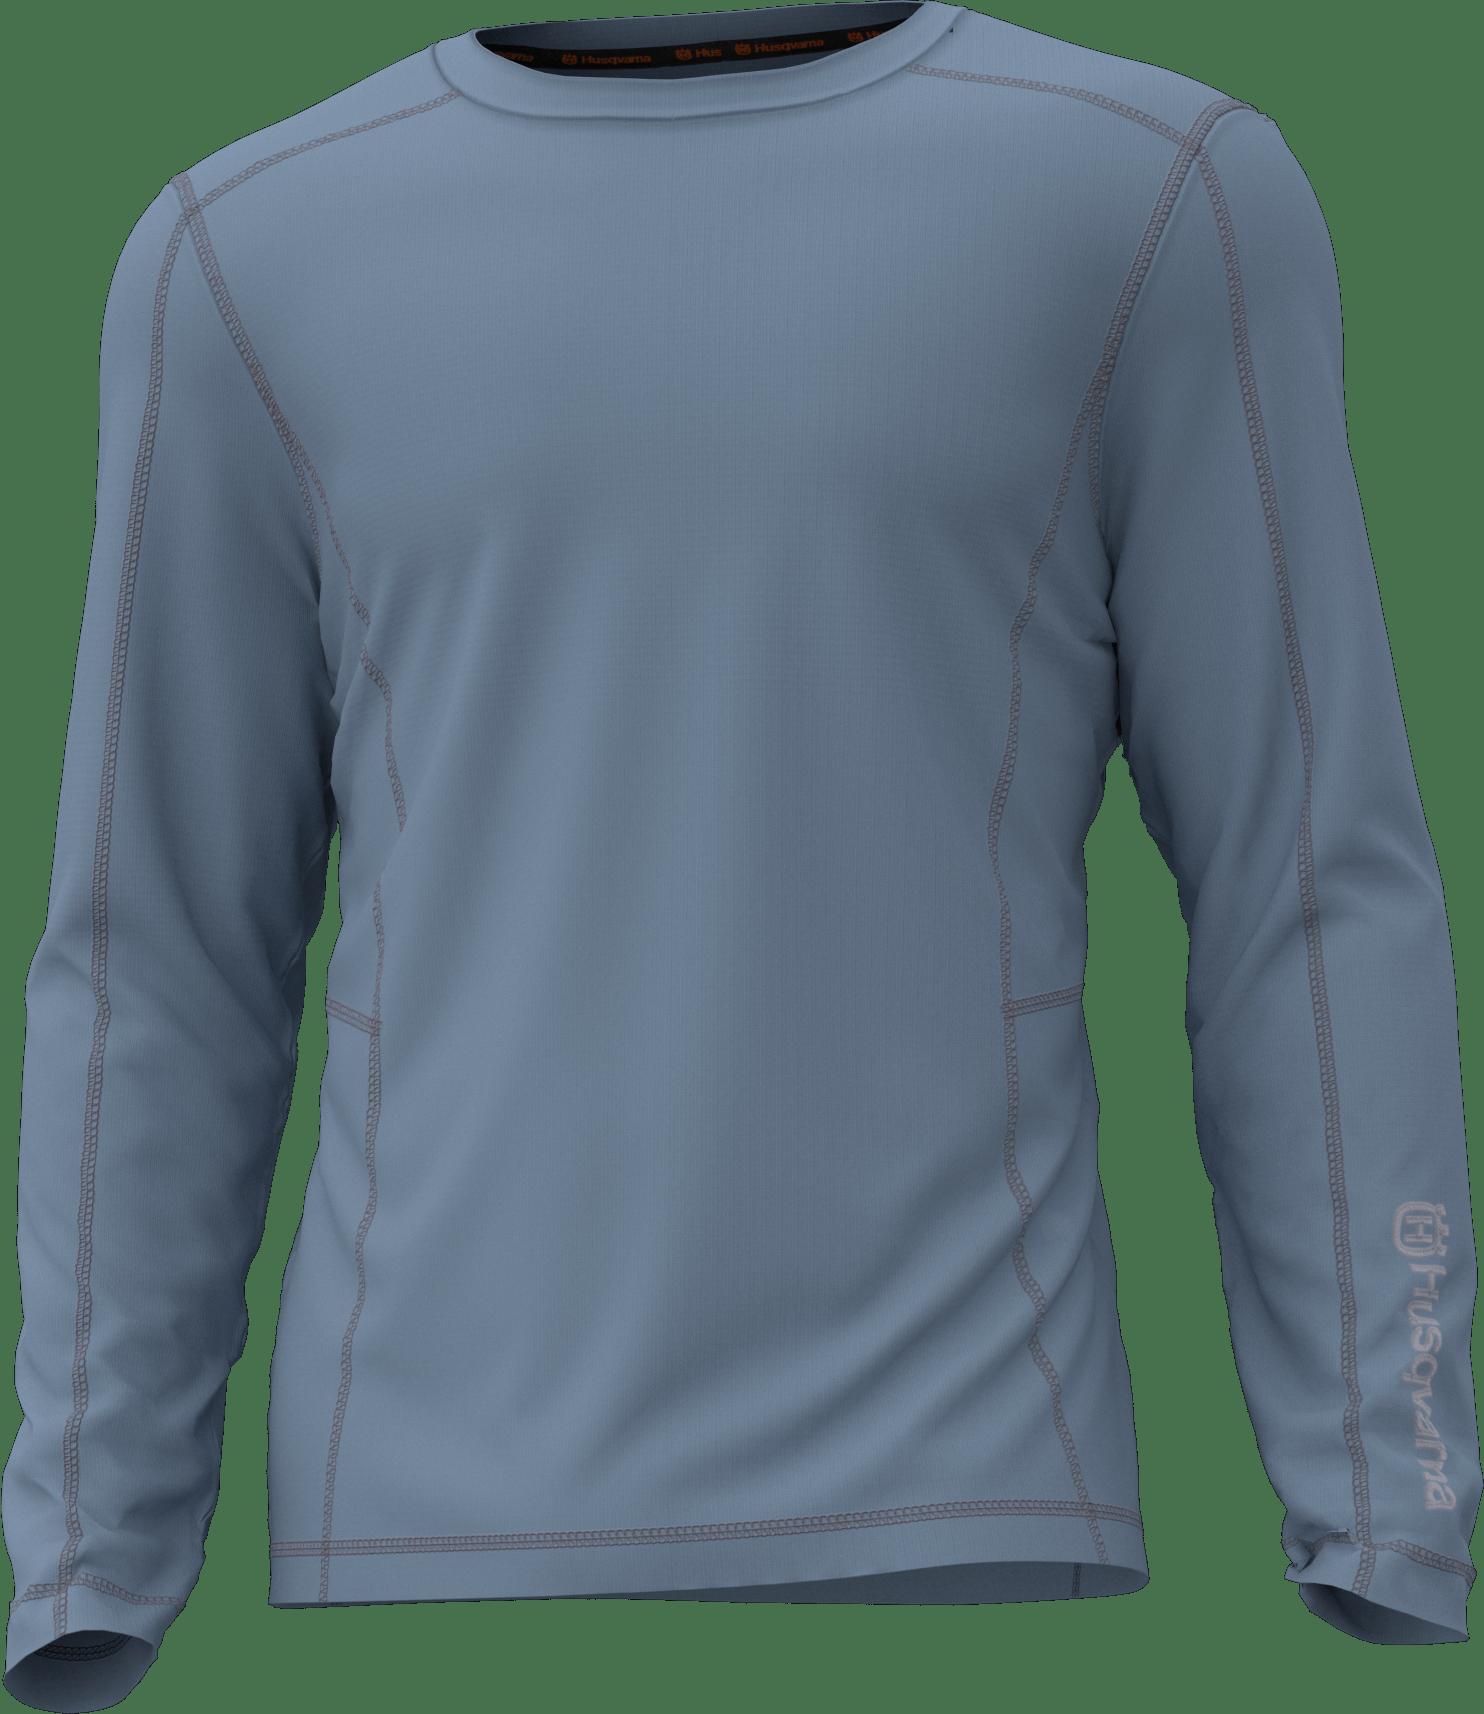 Details about  /Husqvarna 529677754 Large Varme Men/'s Long-Sleeve Performance Shirt UPF 40 L